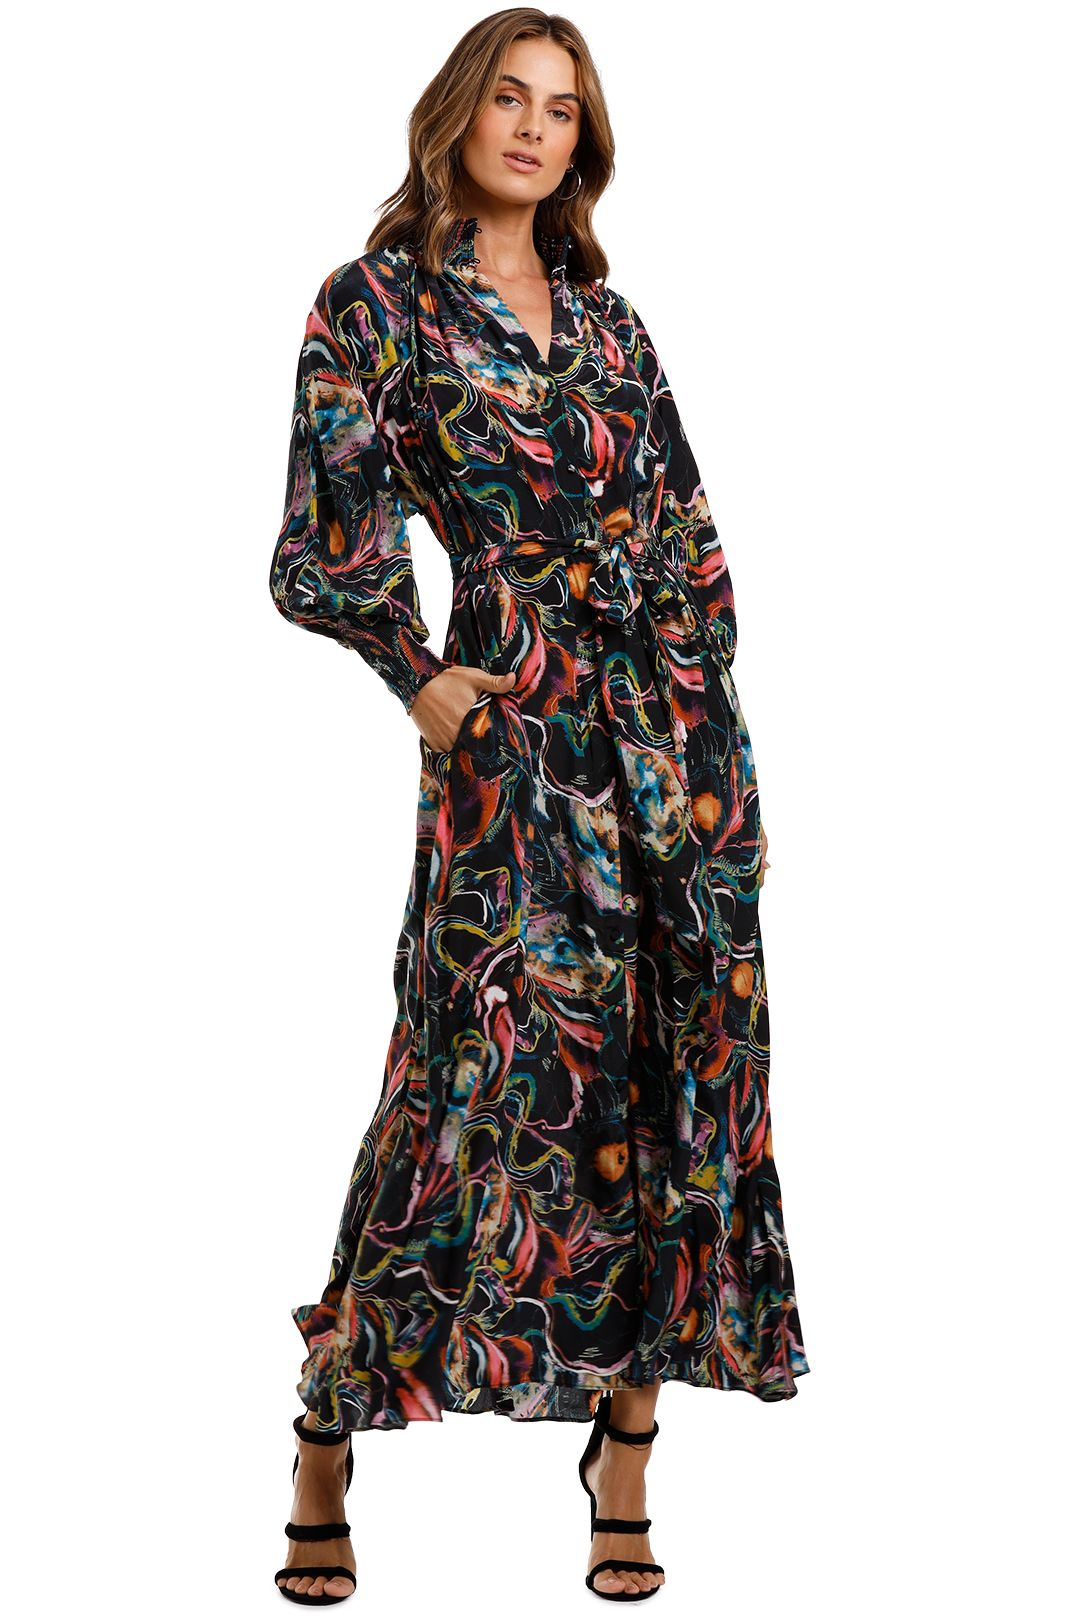 Husk Mont Marte Dress Abstract print